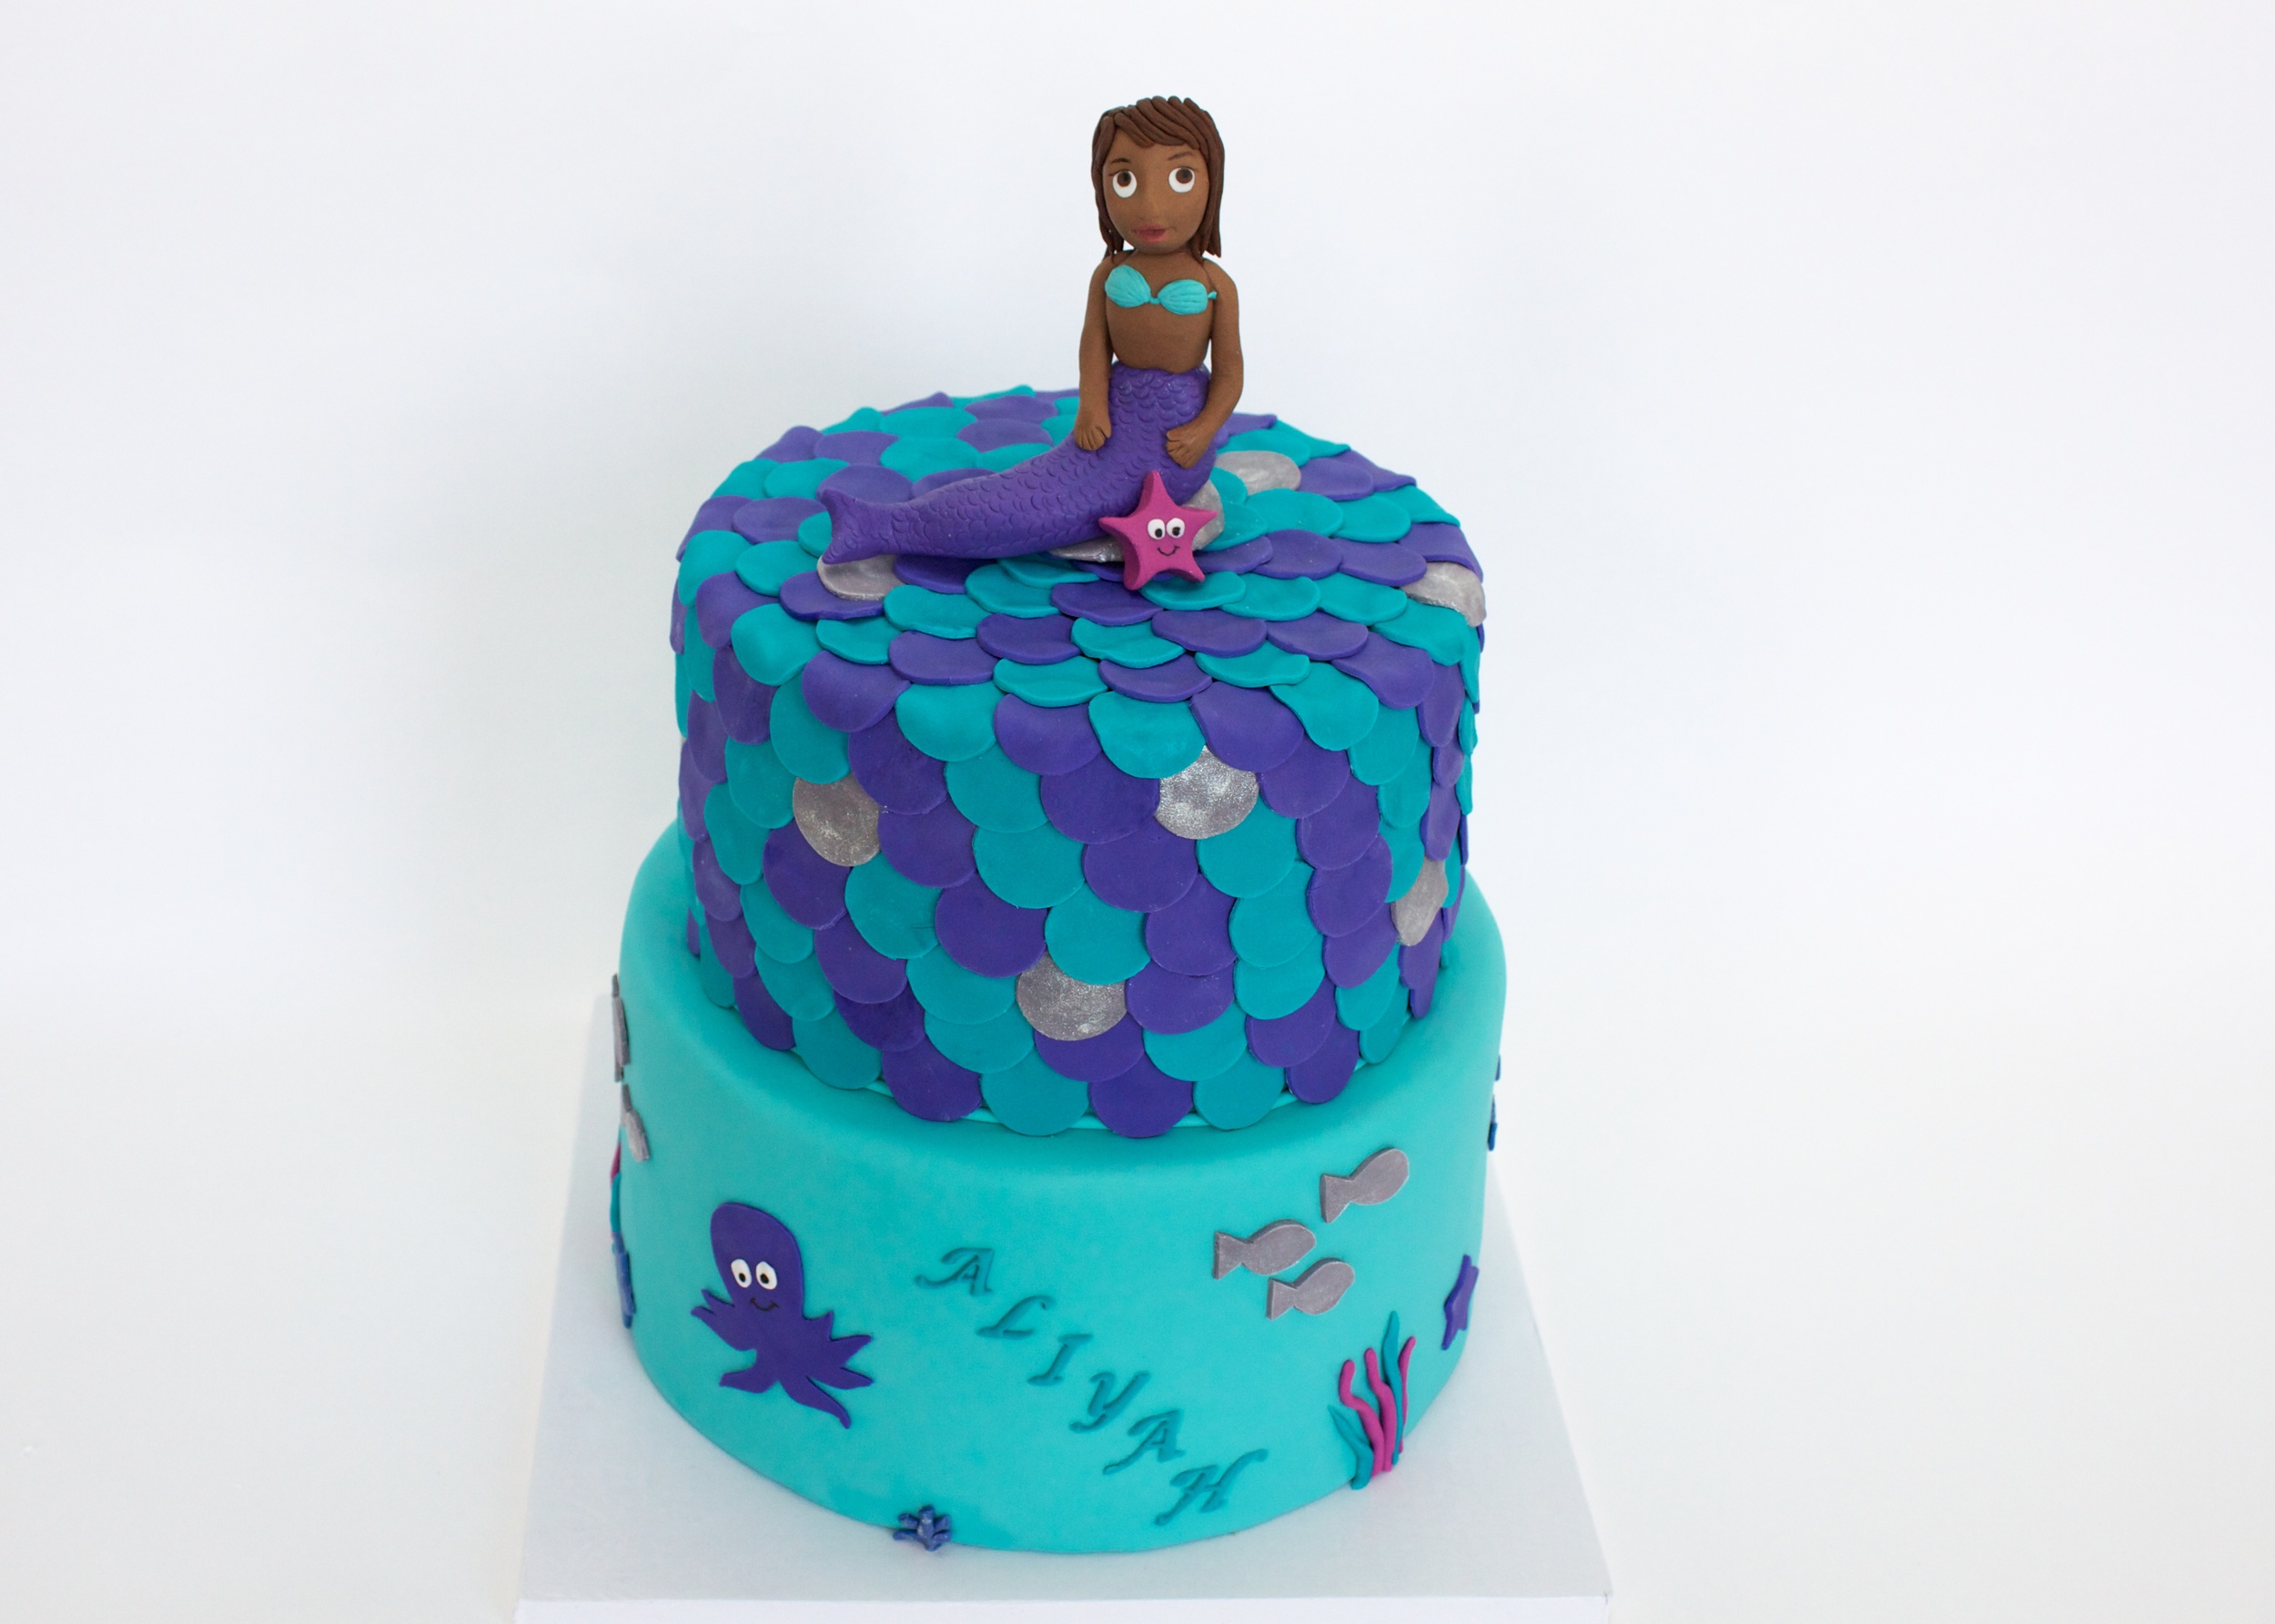 Mermaid cake horiz 7948.jpg